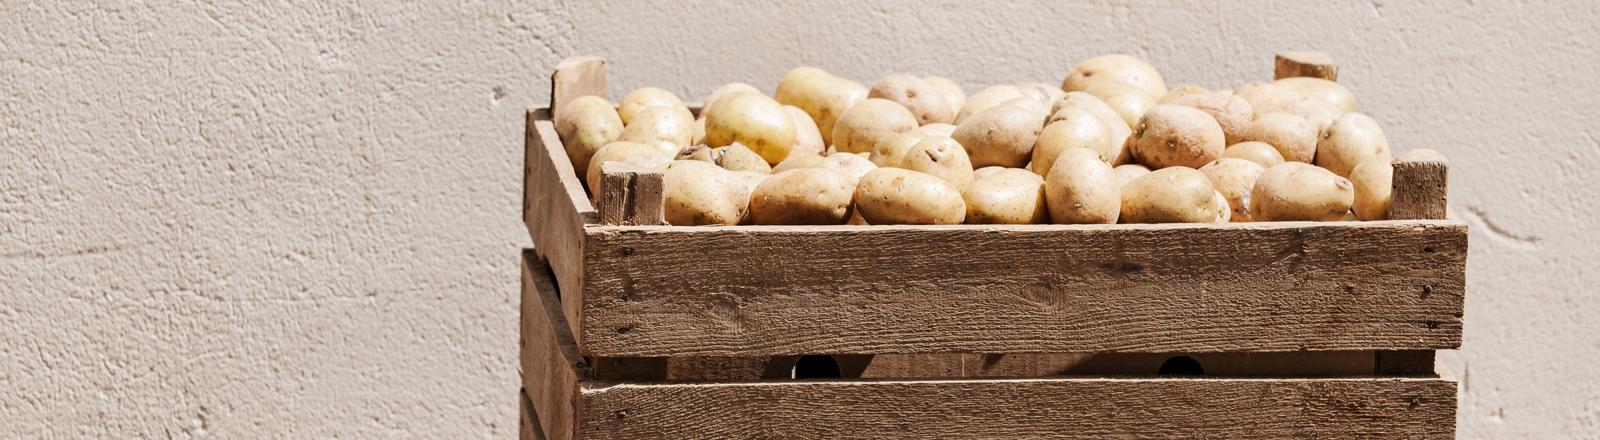 Kiste mit Kartoffeln